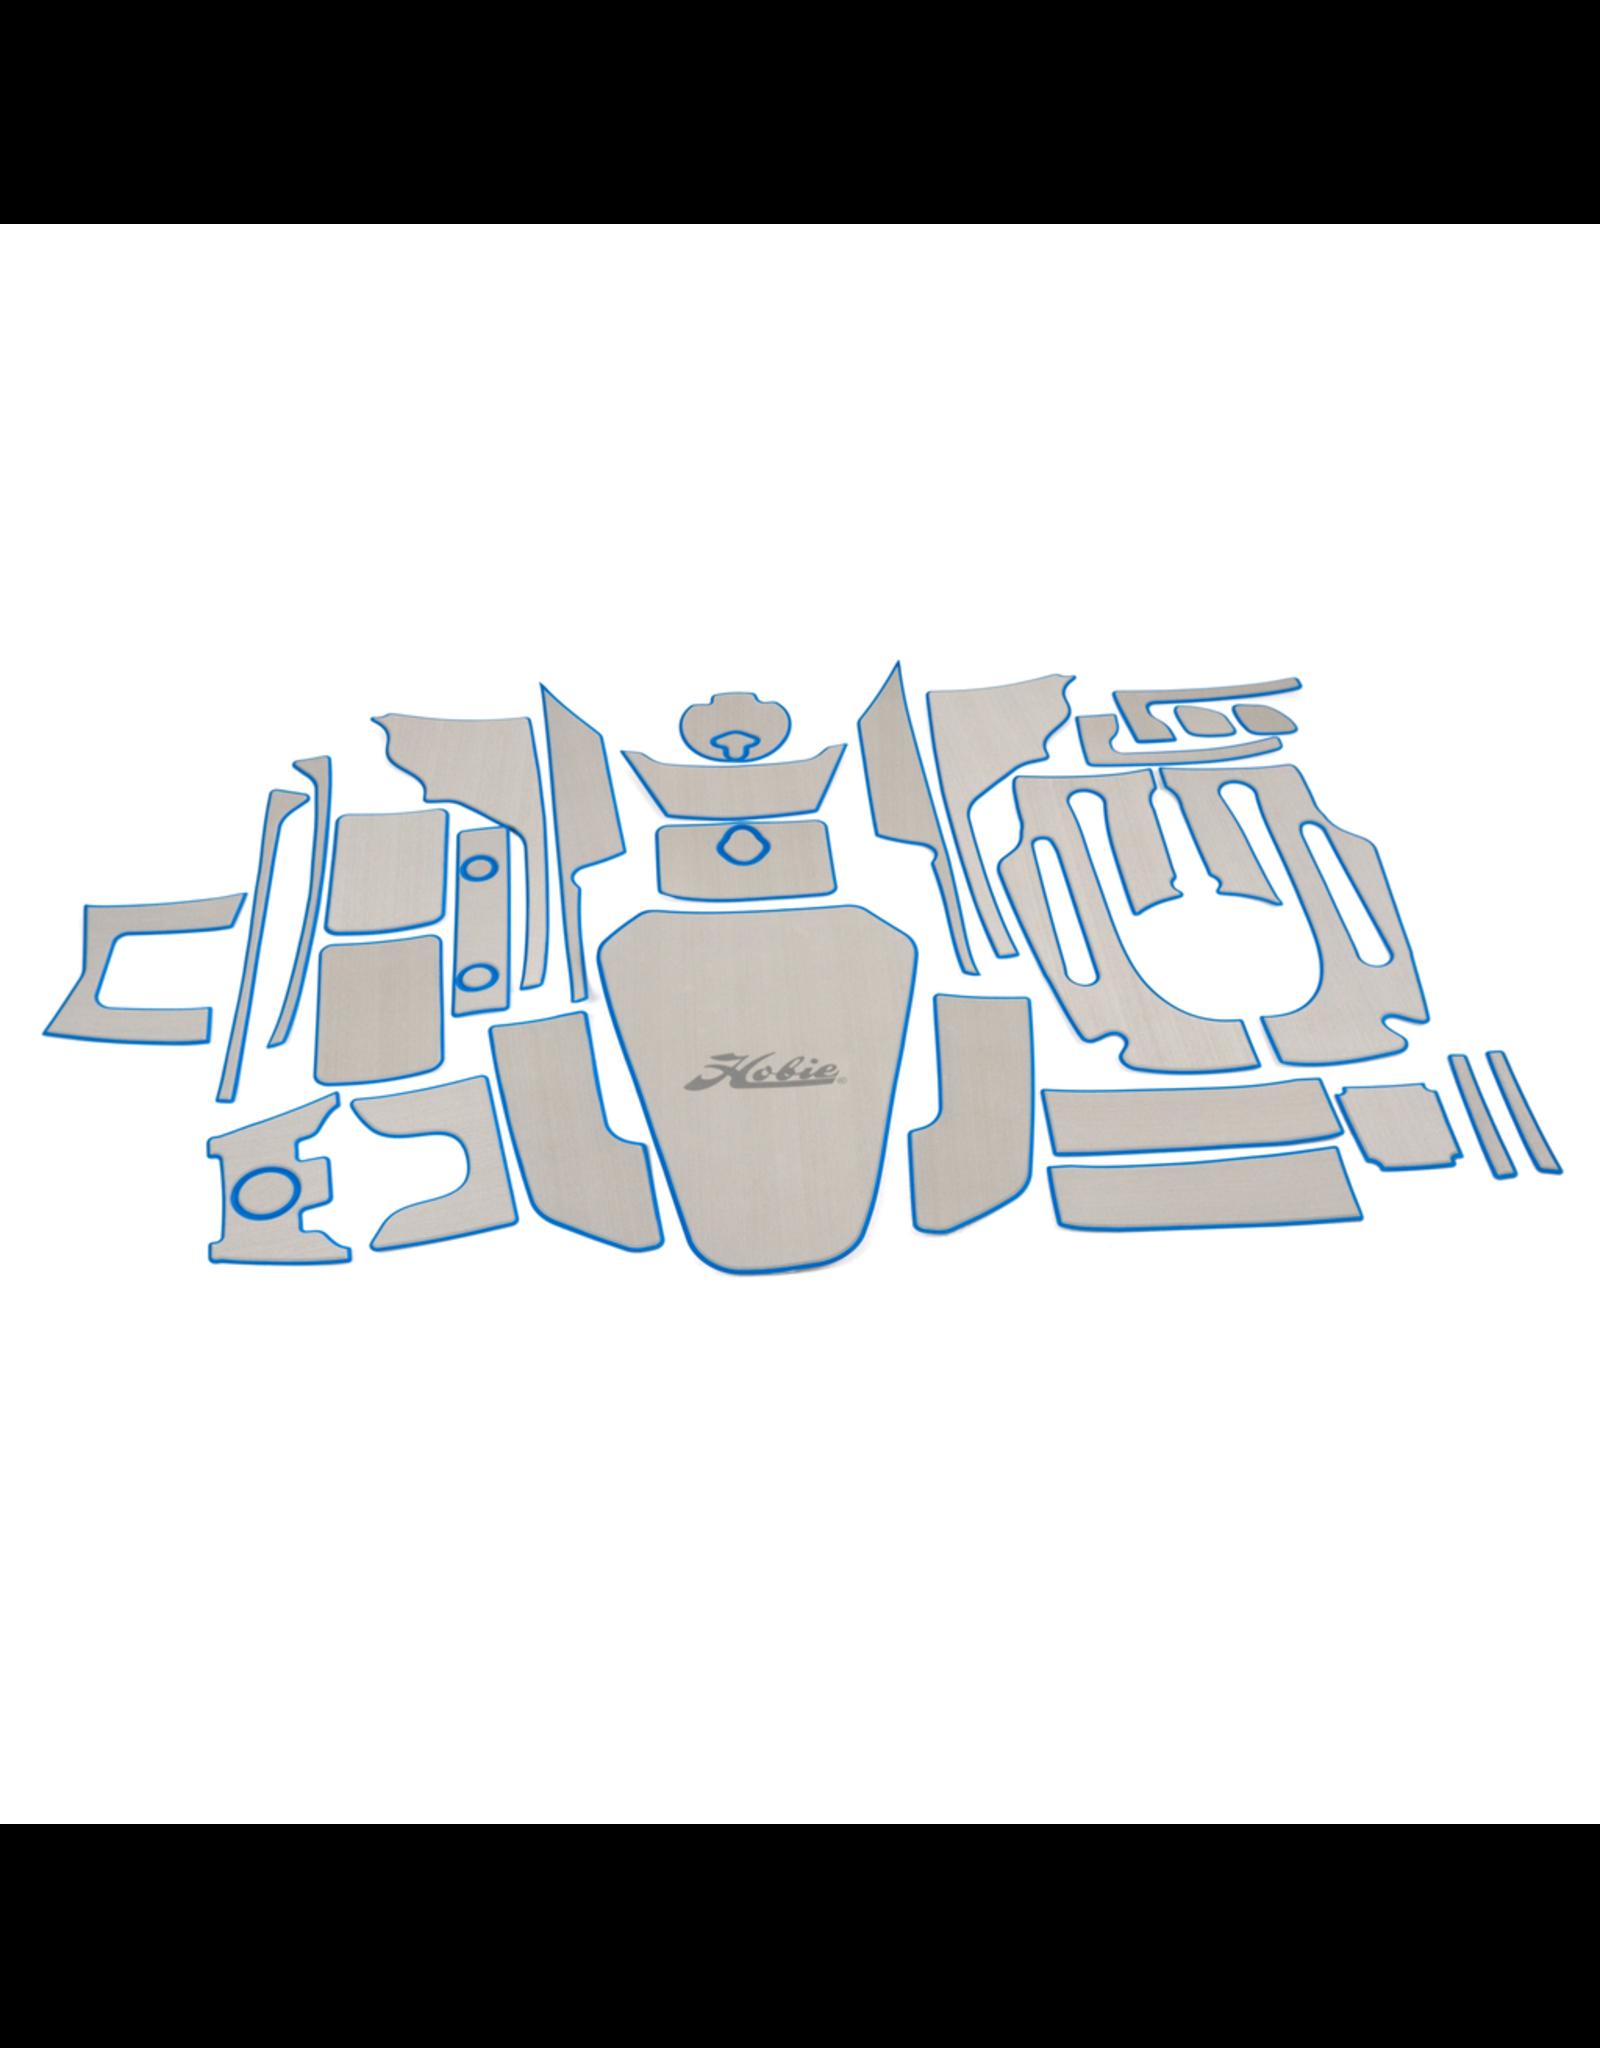 Hobie Hobie Mat Kit for Hobie Pro Angler 14 - Titanium/Blue